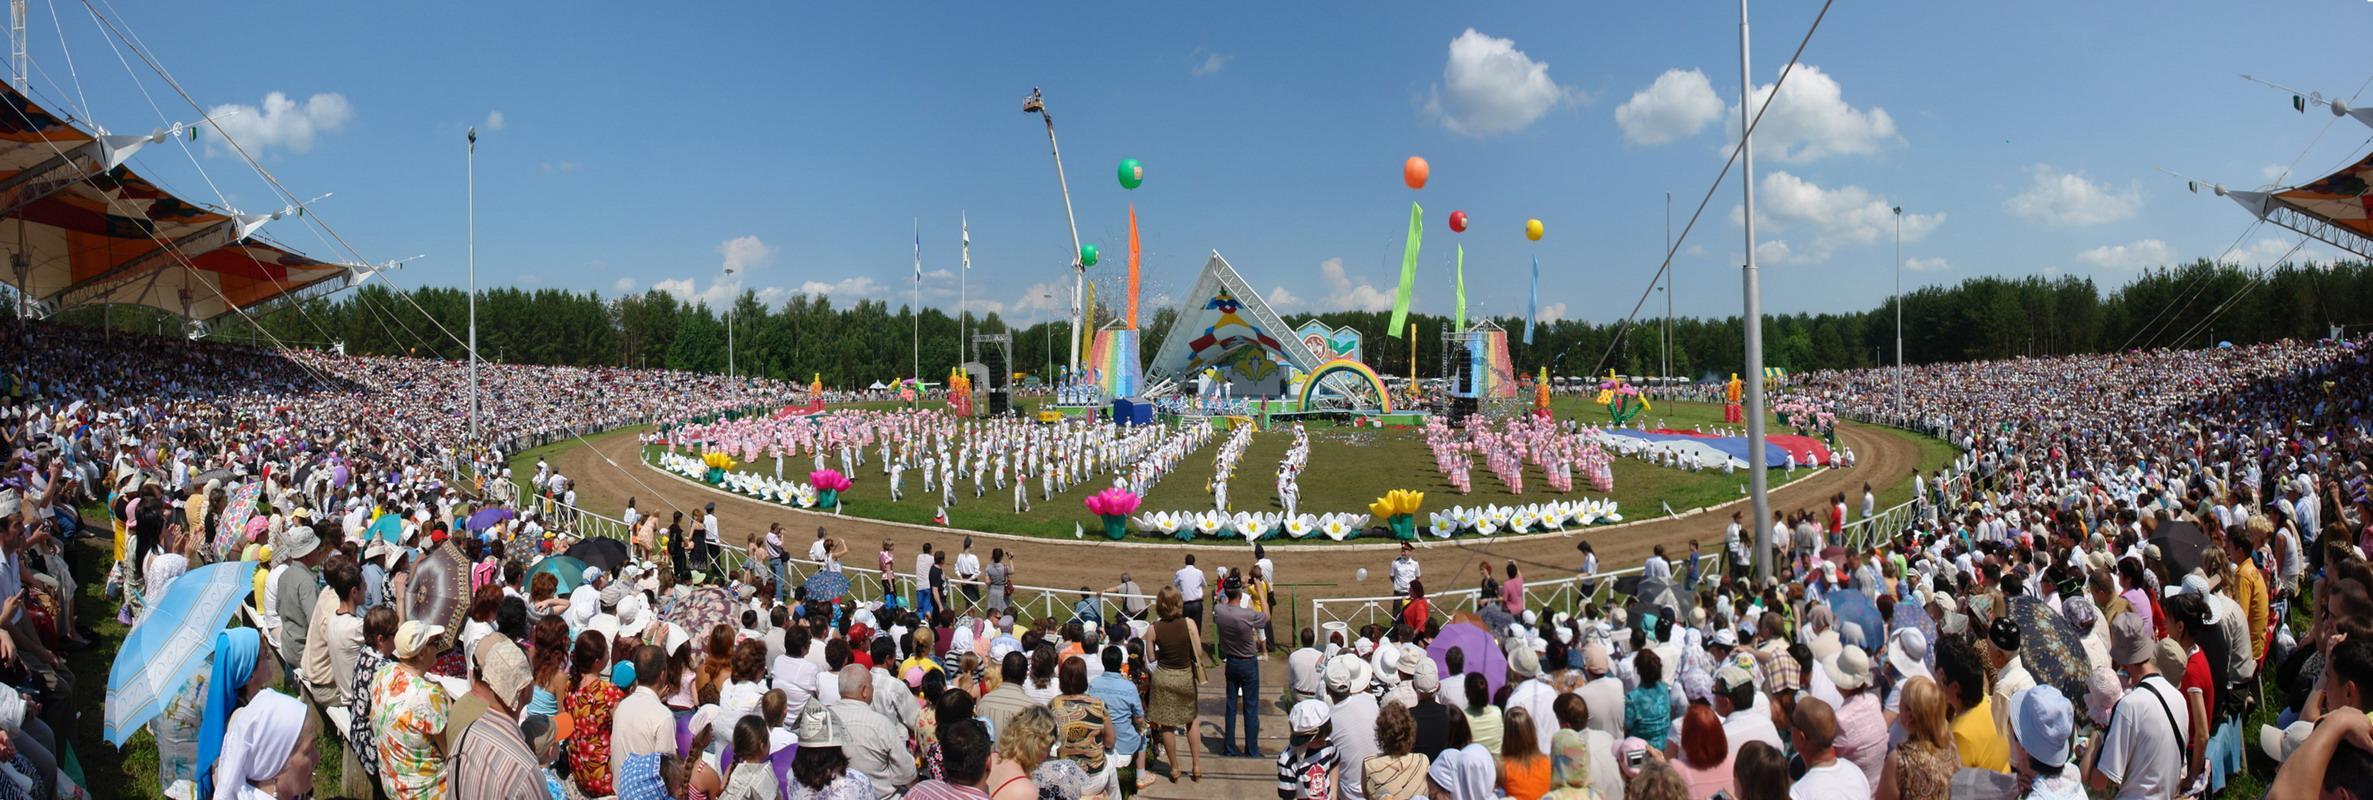 Фото праздника 1 мая г набережные челны 2